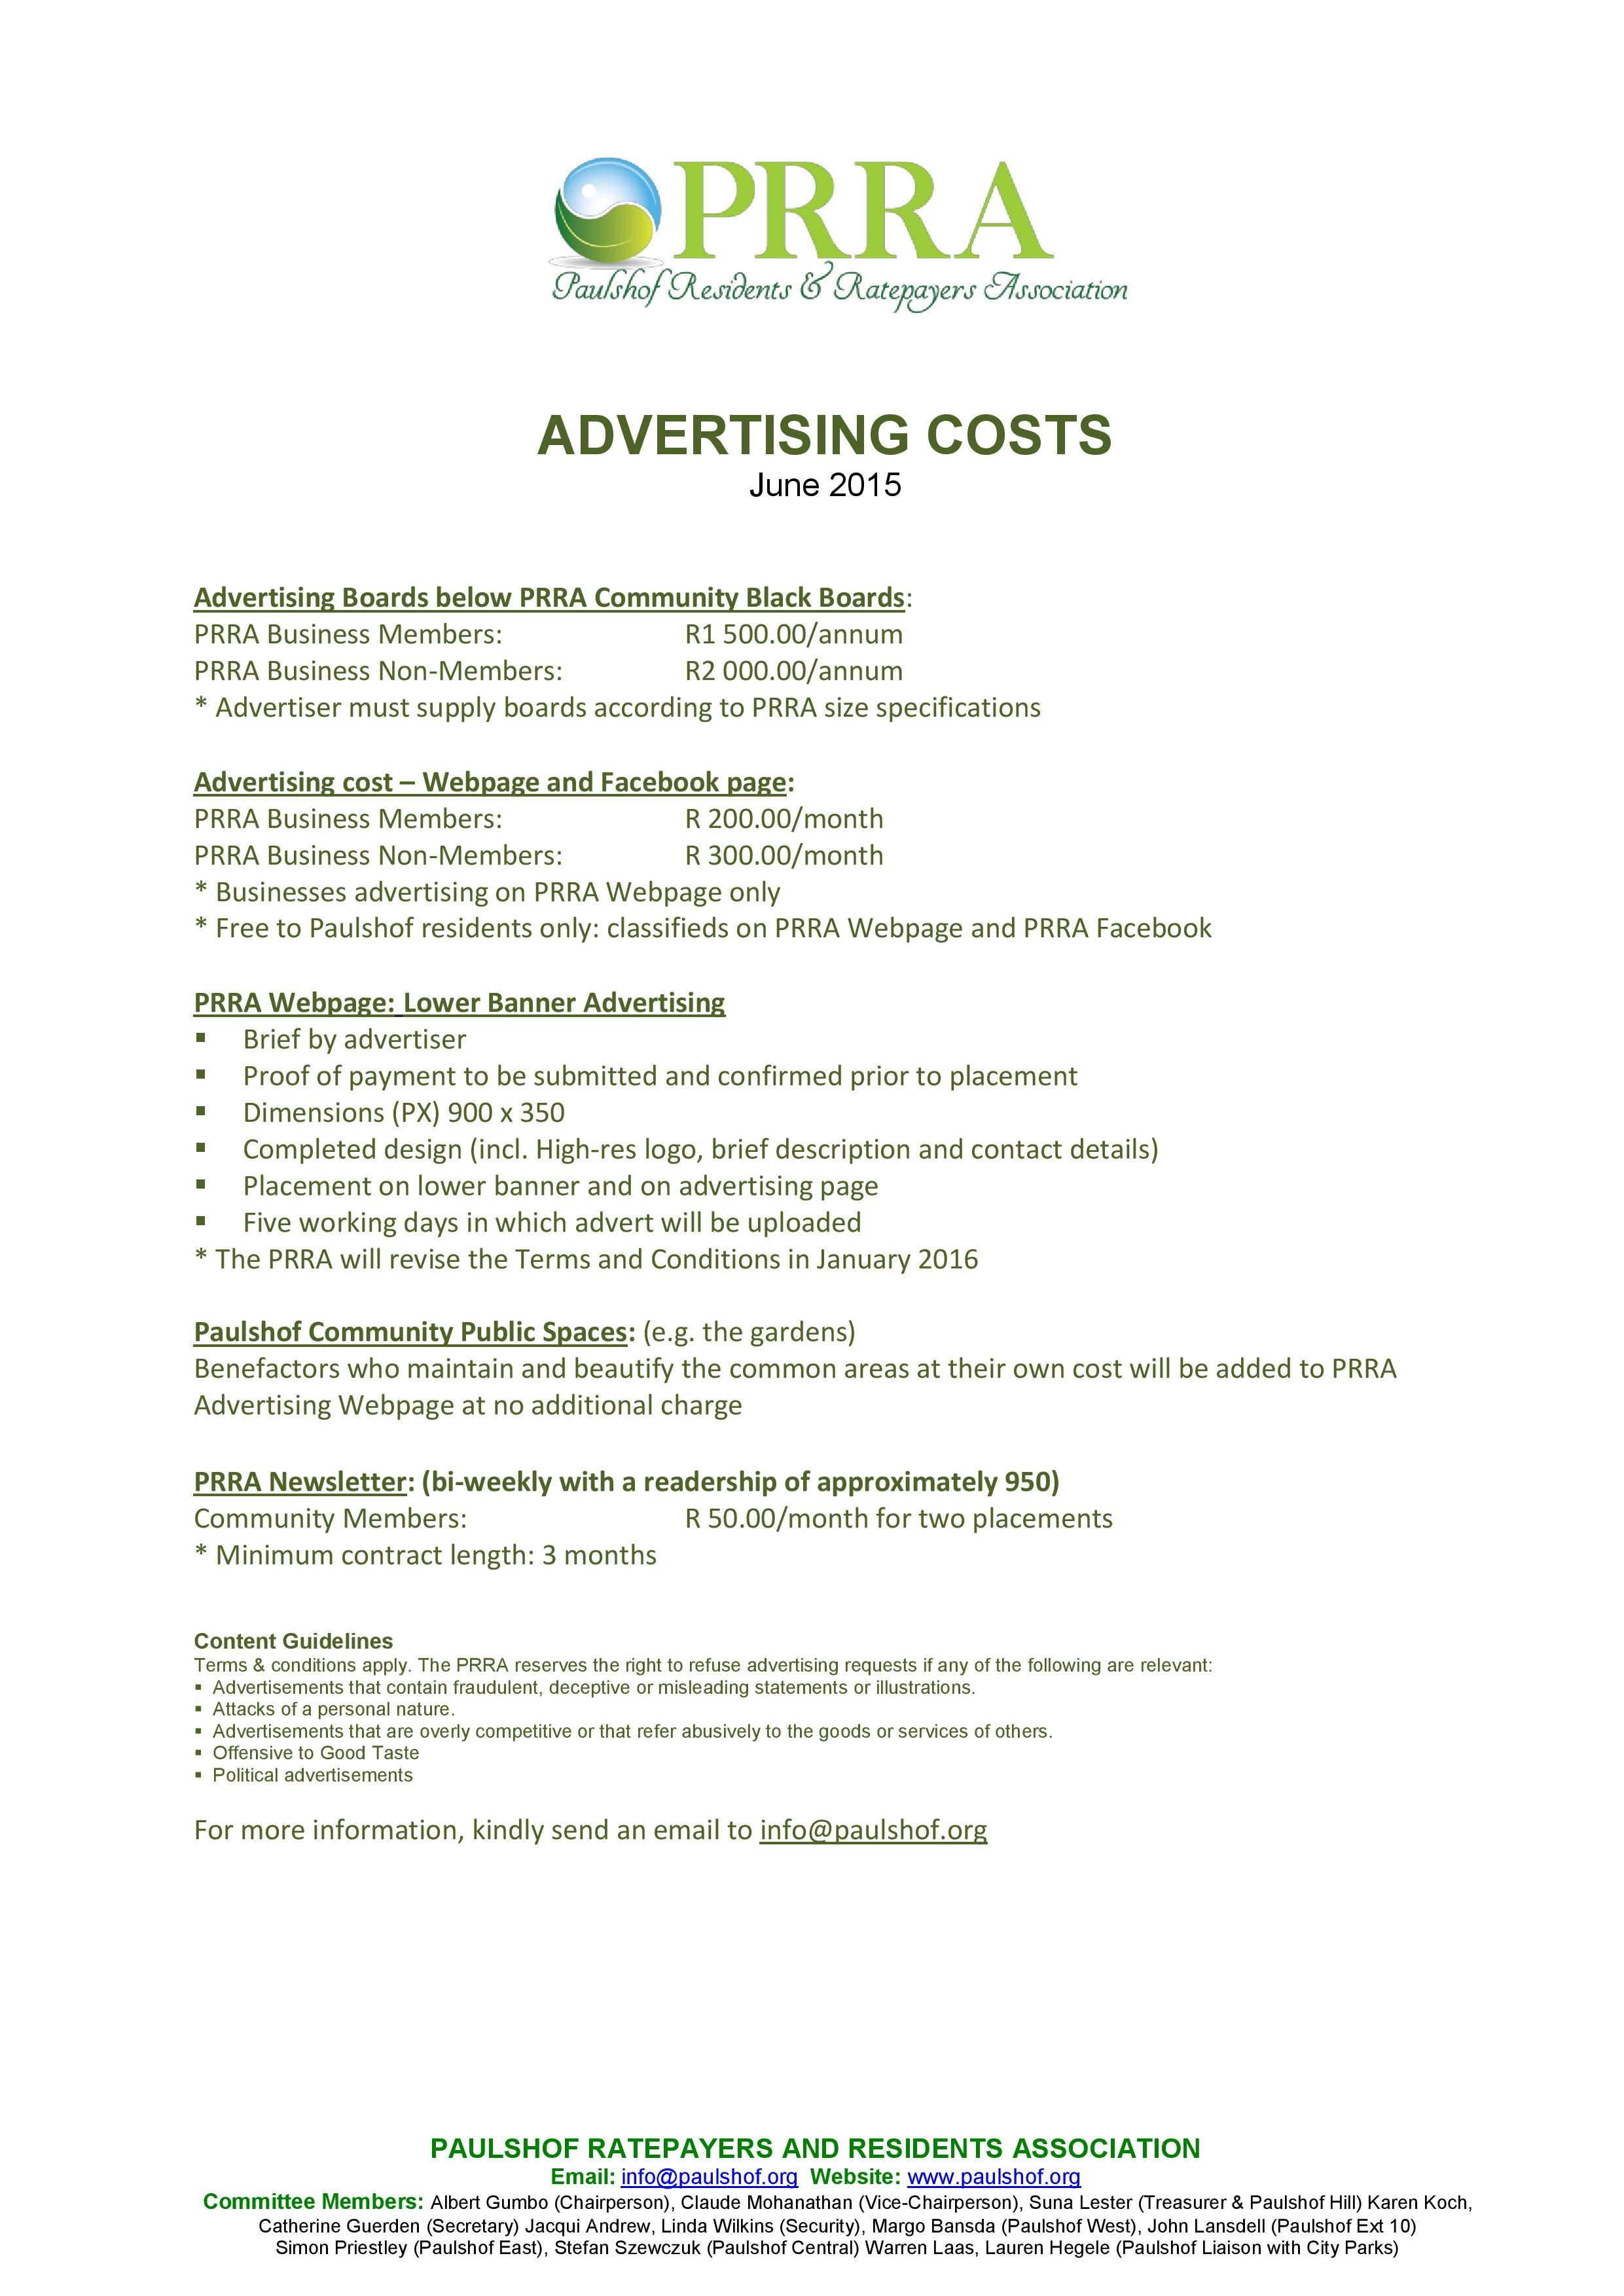 PRRAAdvertisingRates2015-page-001.jpg - 931.80 kB